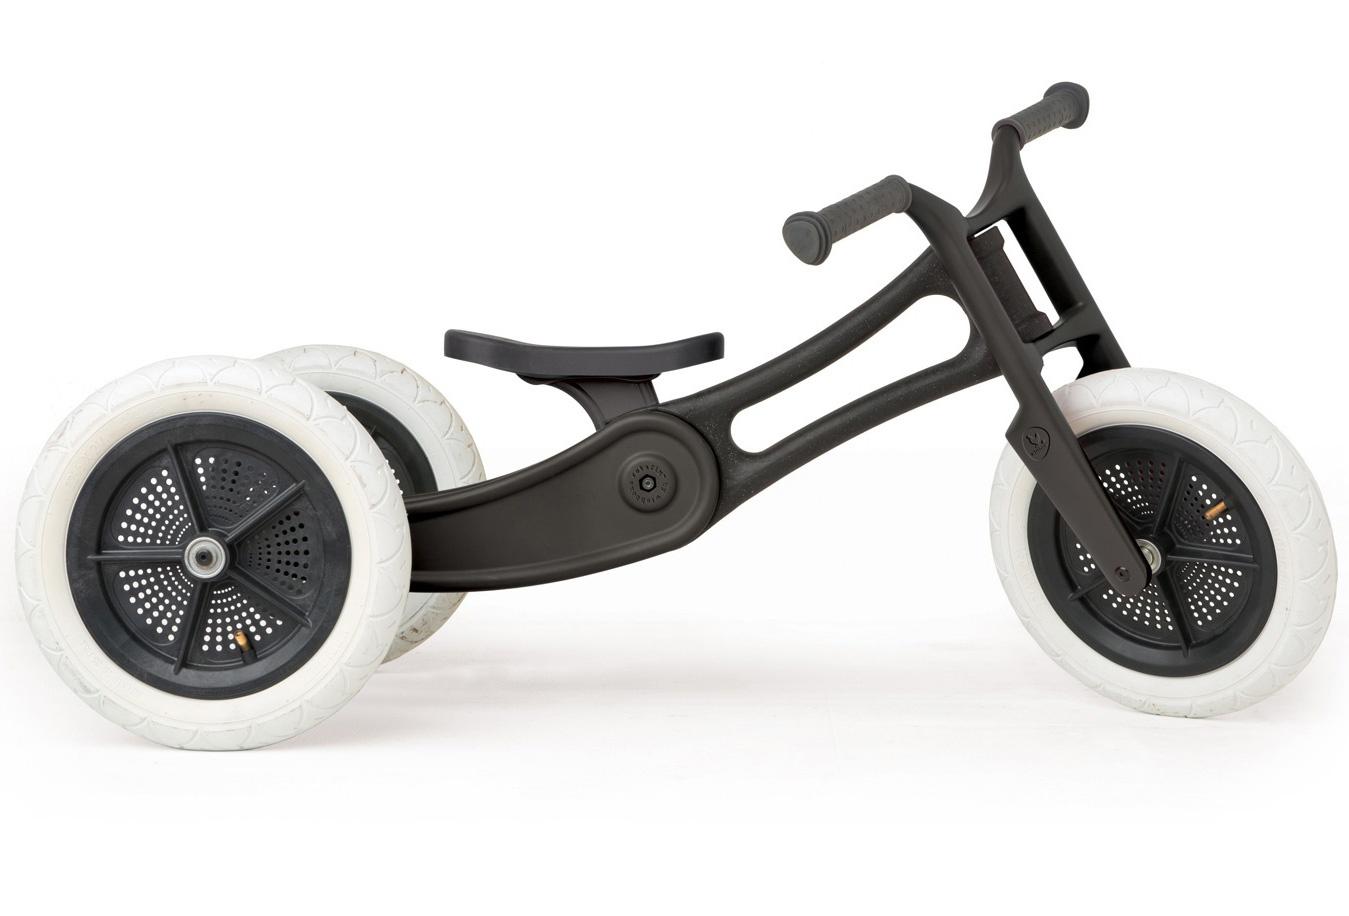 wishbone-bike-recycled-edition-3in1-by-wishbone-design-studio